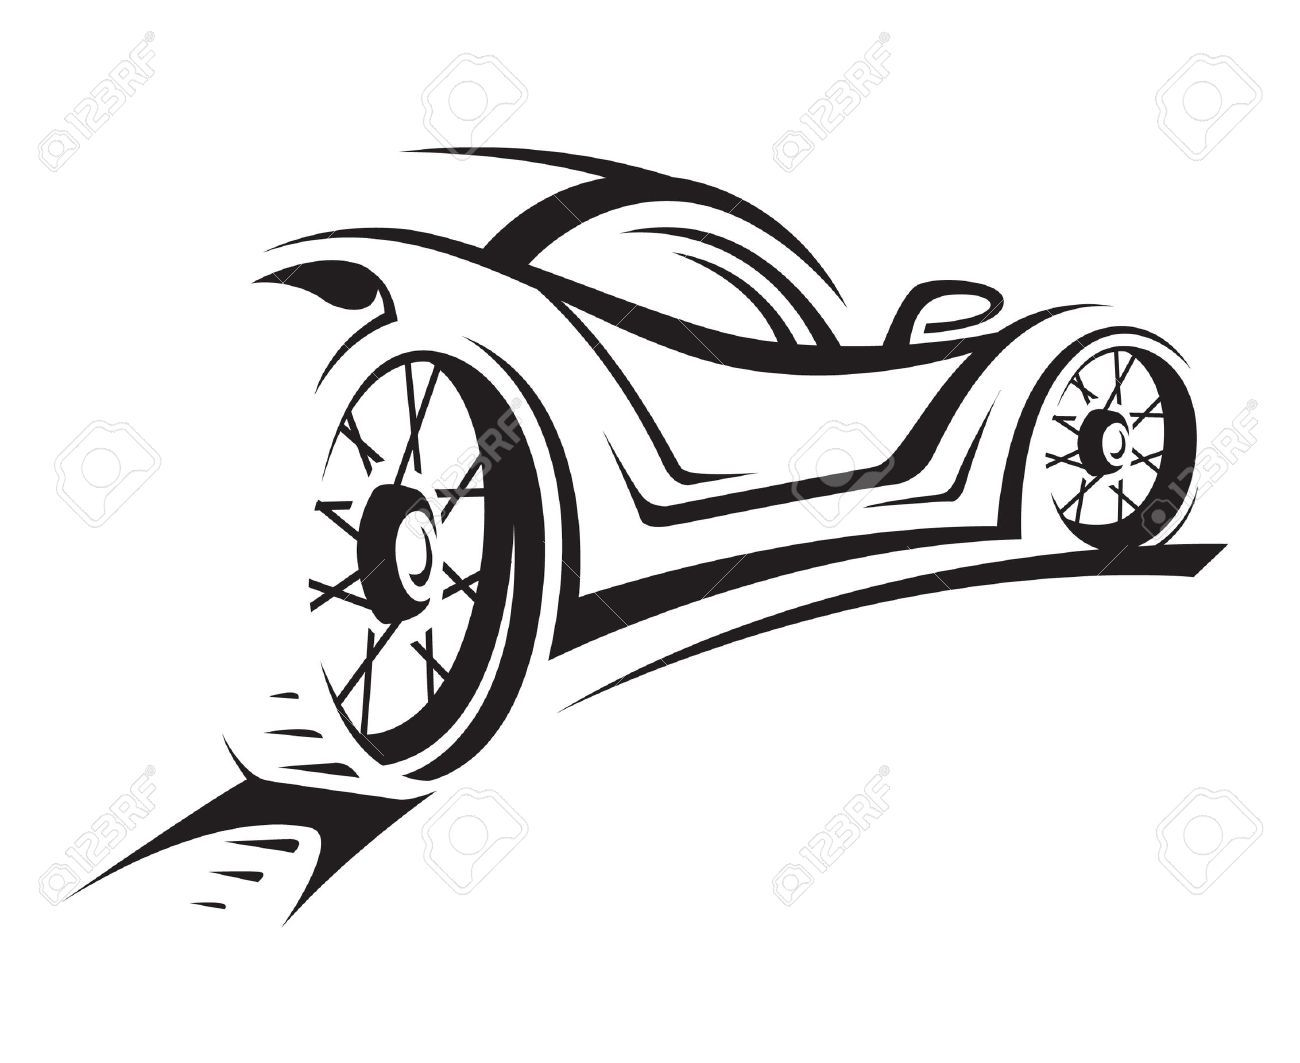 Race car silhouette clipart.